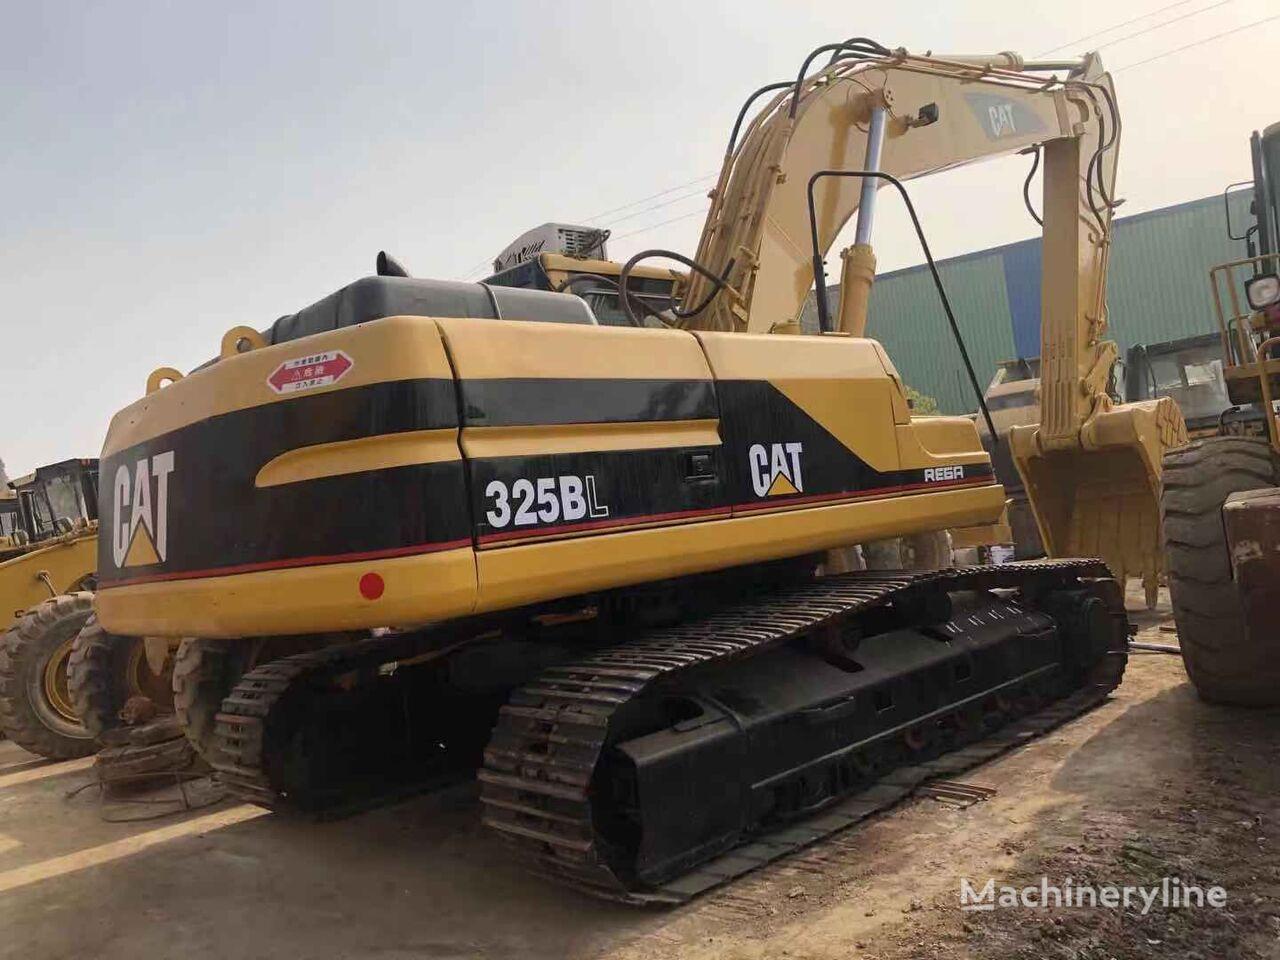 CATERPILLAR 325BL tracked excavator